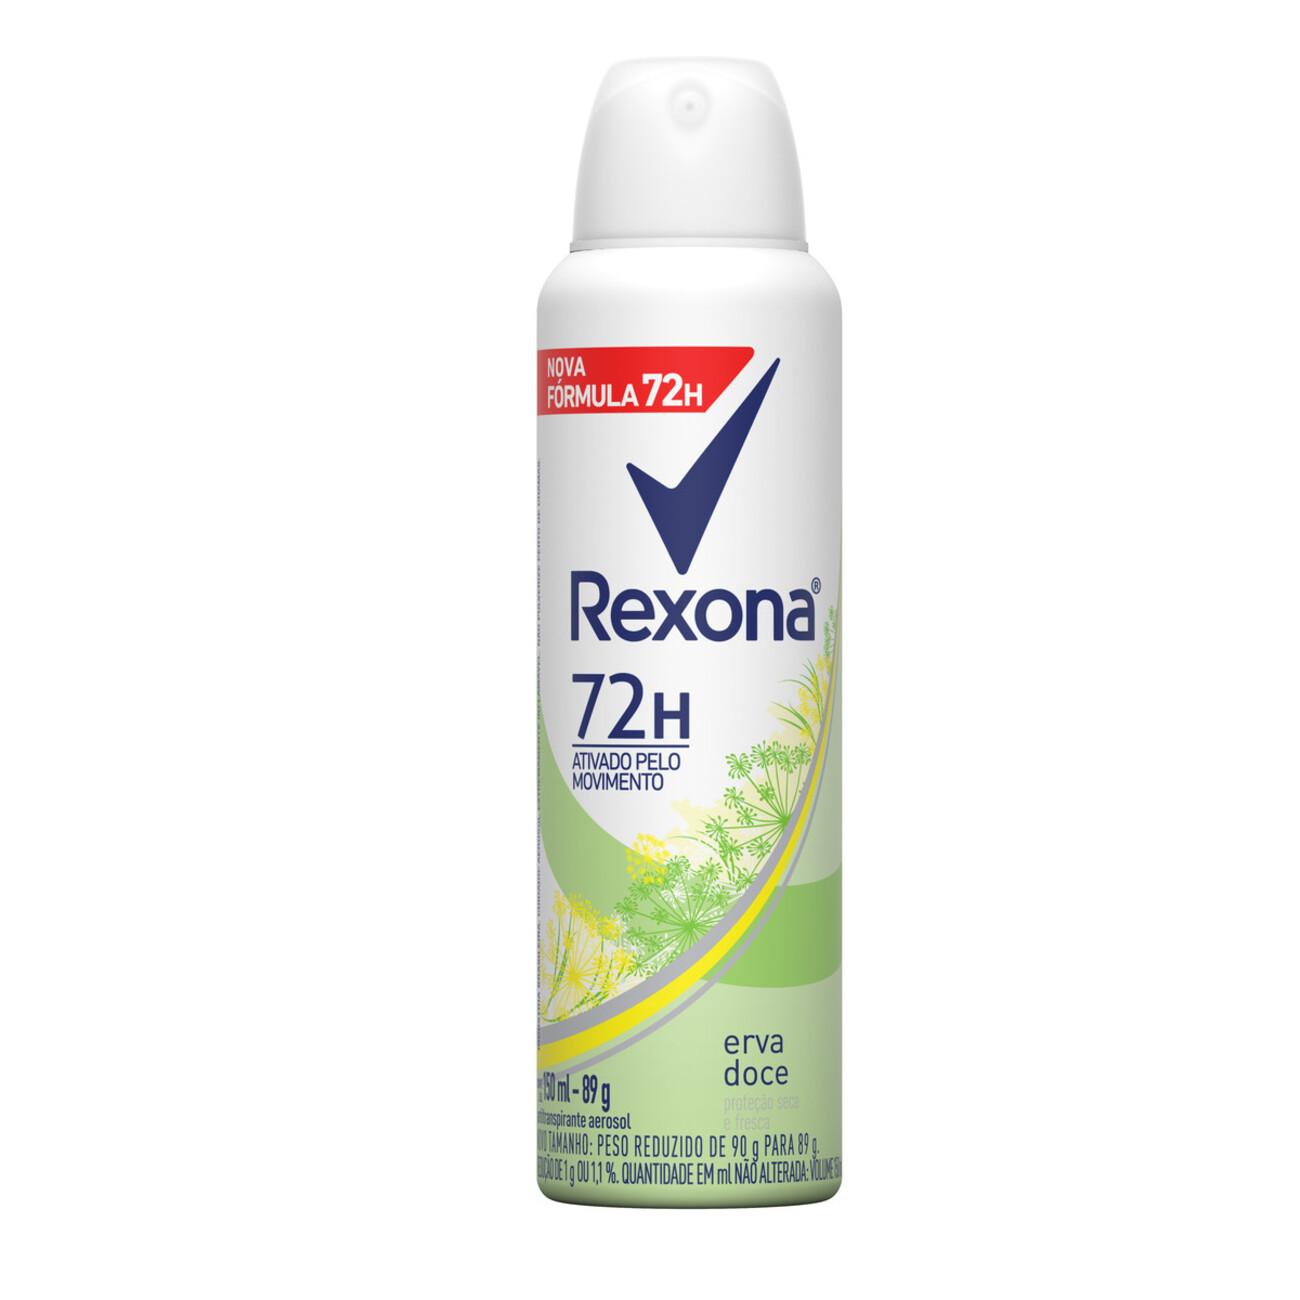 Desodorante Antitranspirante Rexona Feminino Aerosol Erva Doce 72 horas 150mL